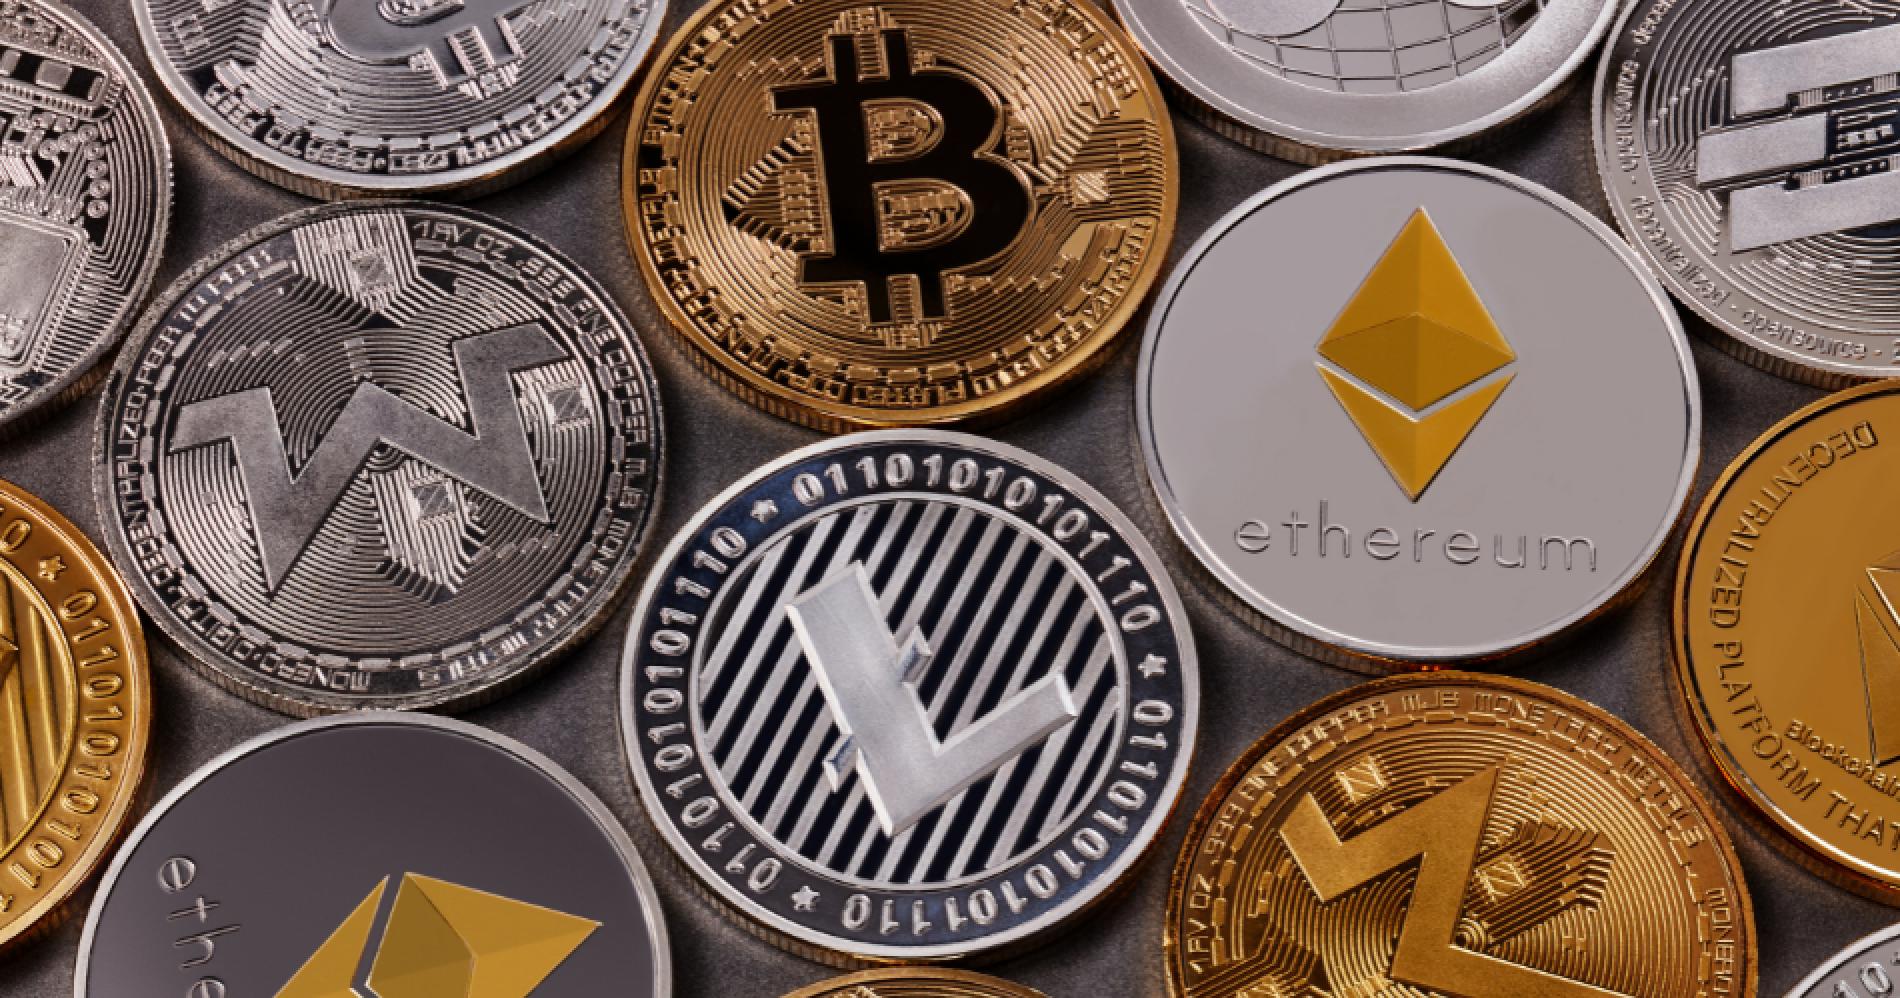 Istilah-Istilah Crypto untuk Trader Newbie Illustration Web Bisnis Muda - Canva